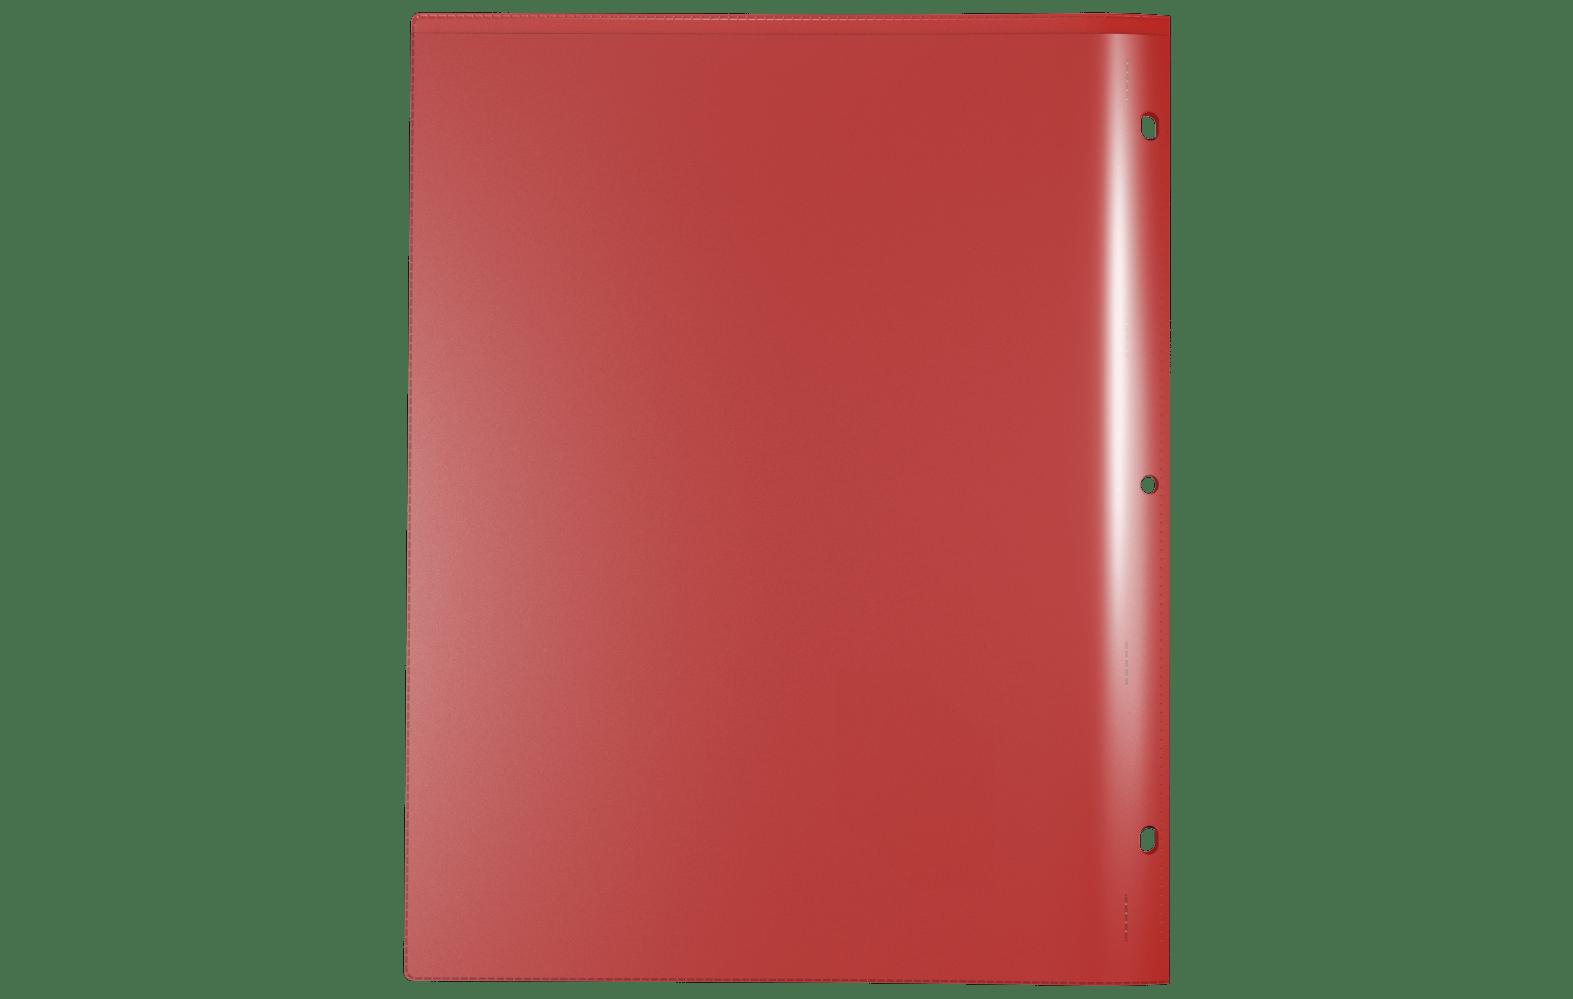 Home Insurance Binder Form